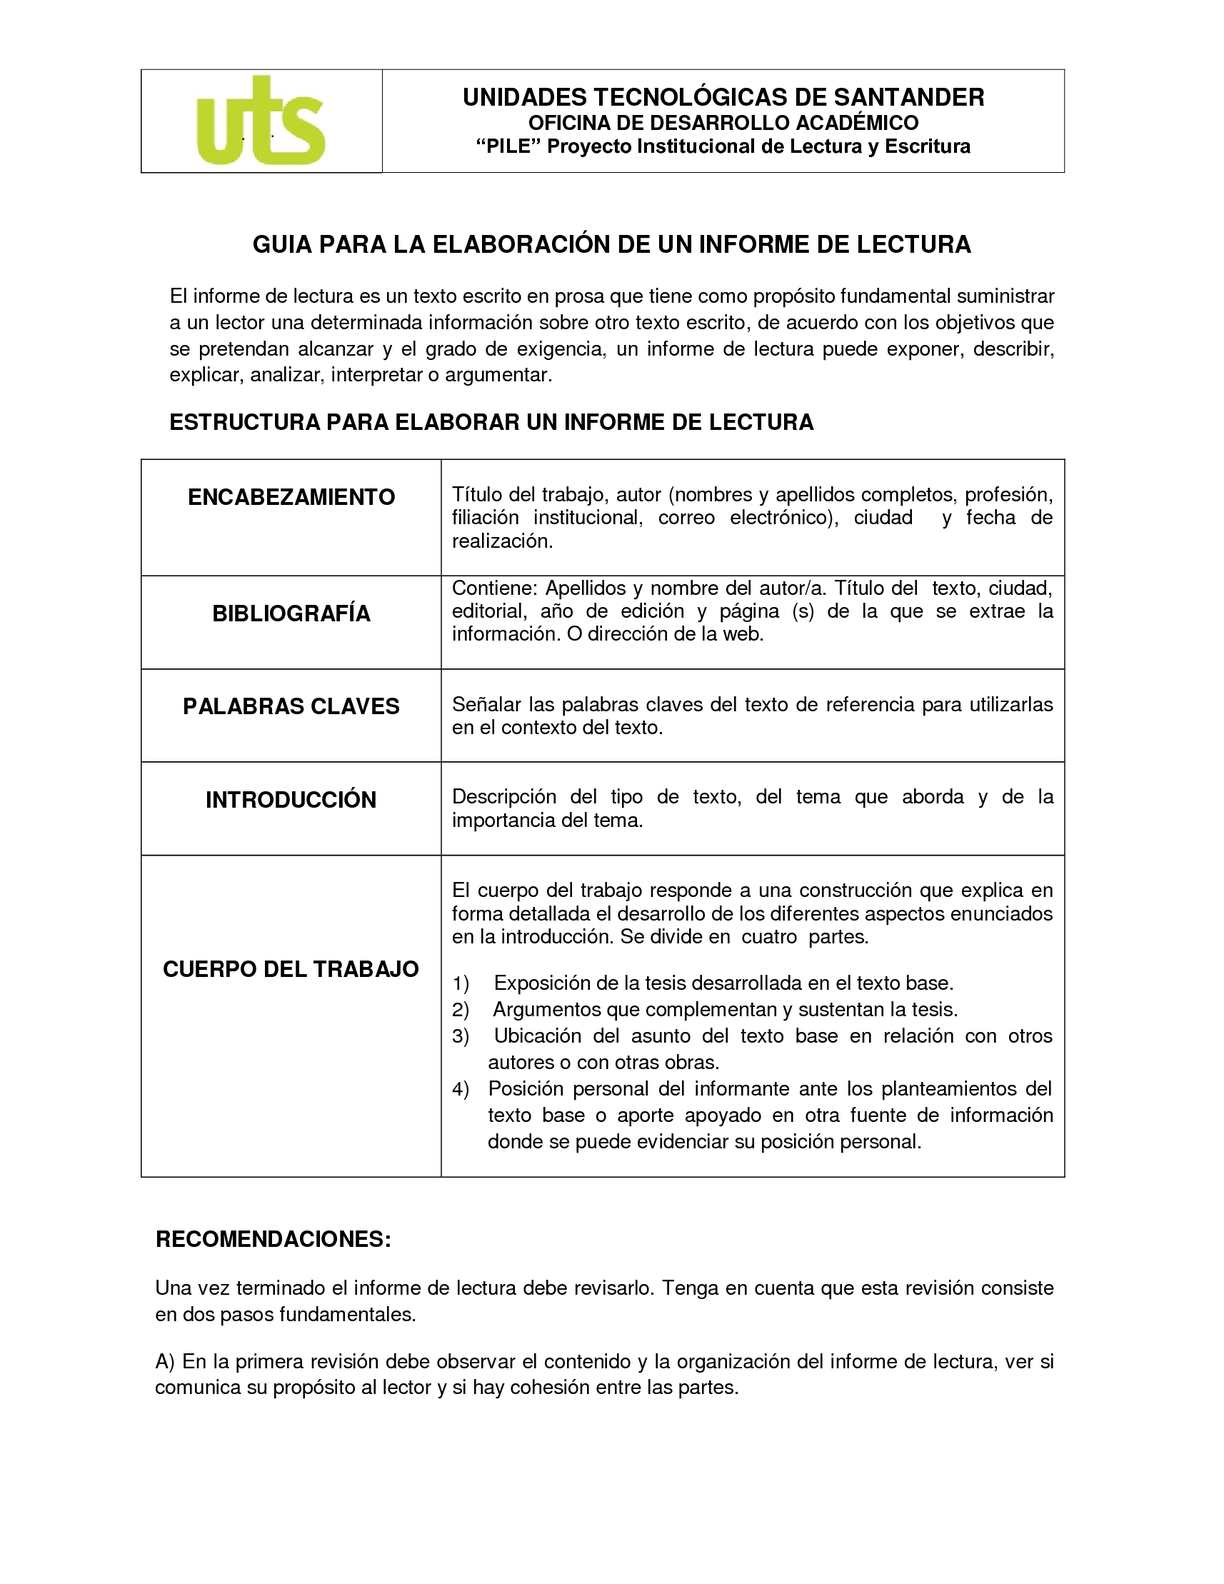 Calaméo - GUIA PARA LA ELABORACIÓN DE UN INFORME DE LECTURA